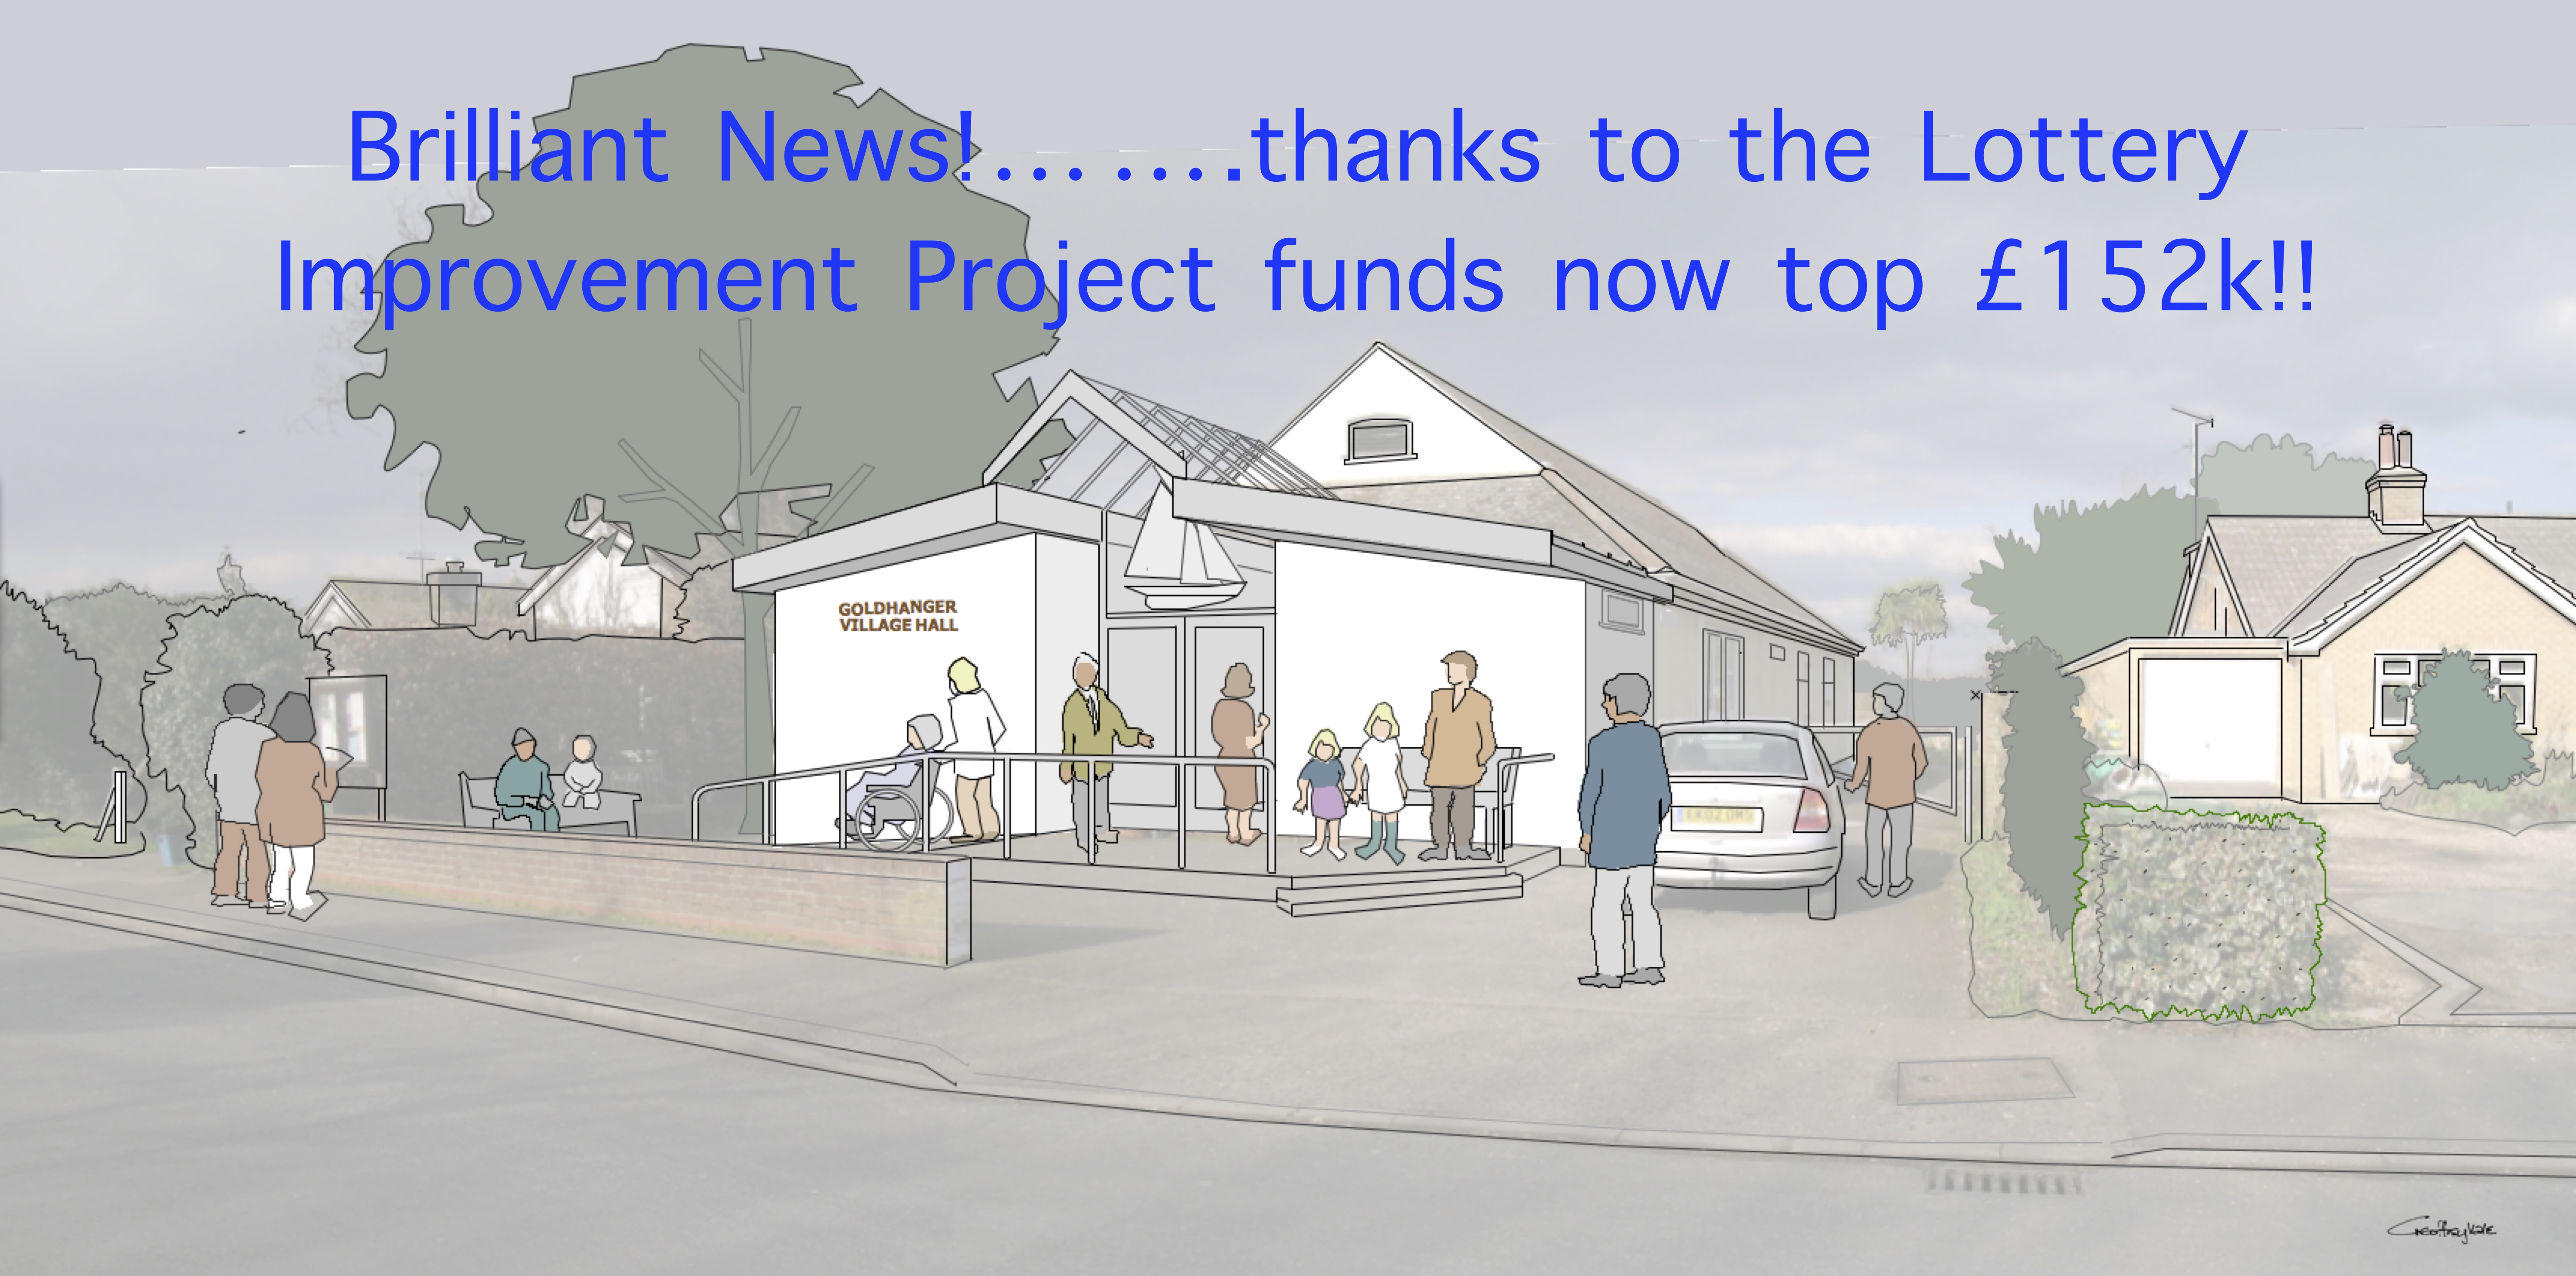 Improvement Project - BIG Lottery Award